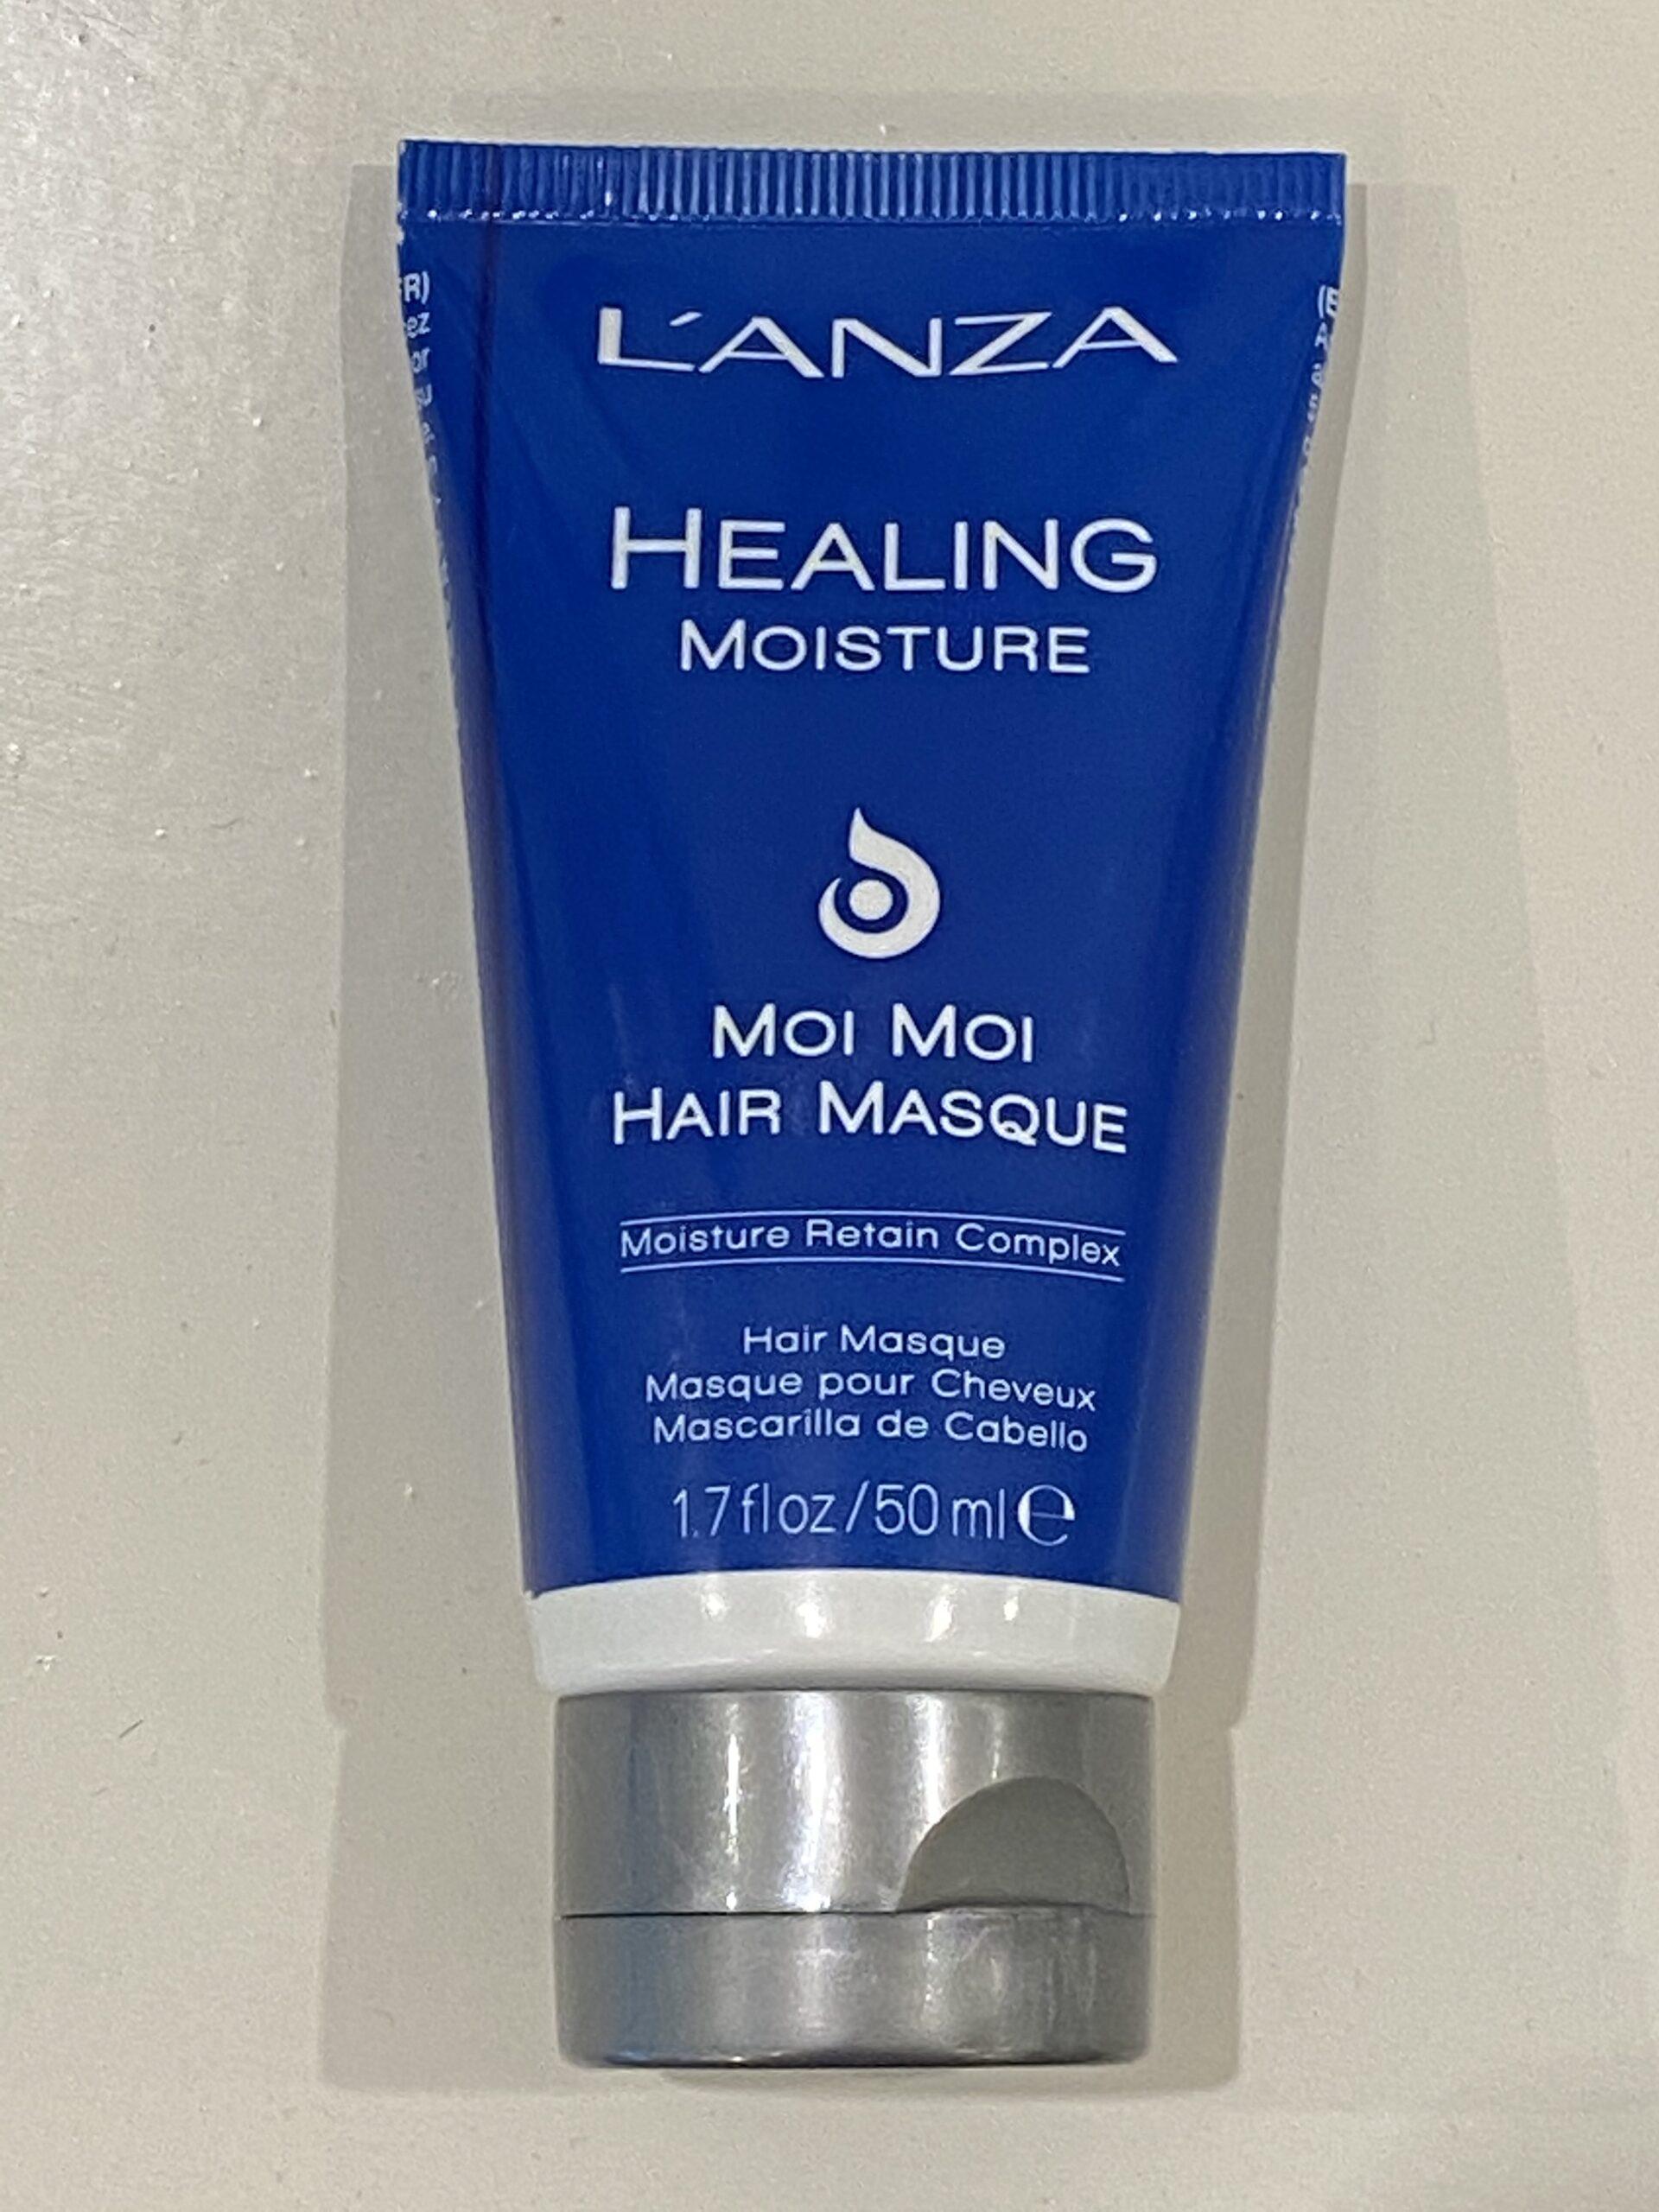 L'anza Healing Moisture Moi Moi Masque 50ml